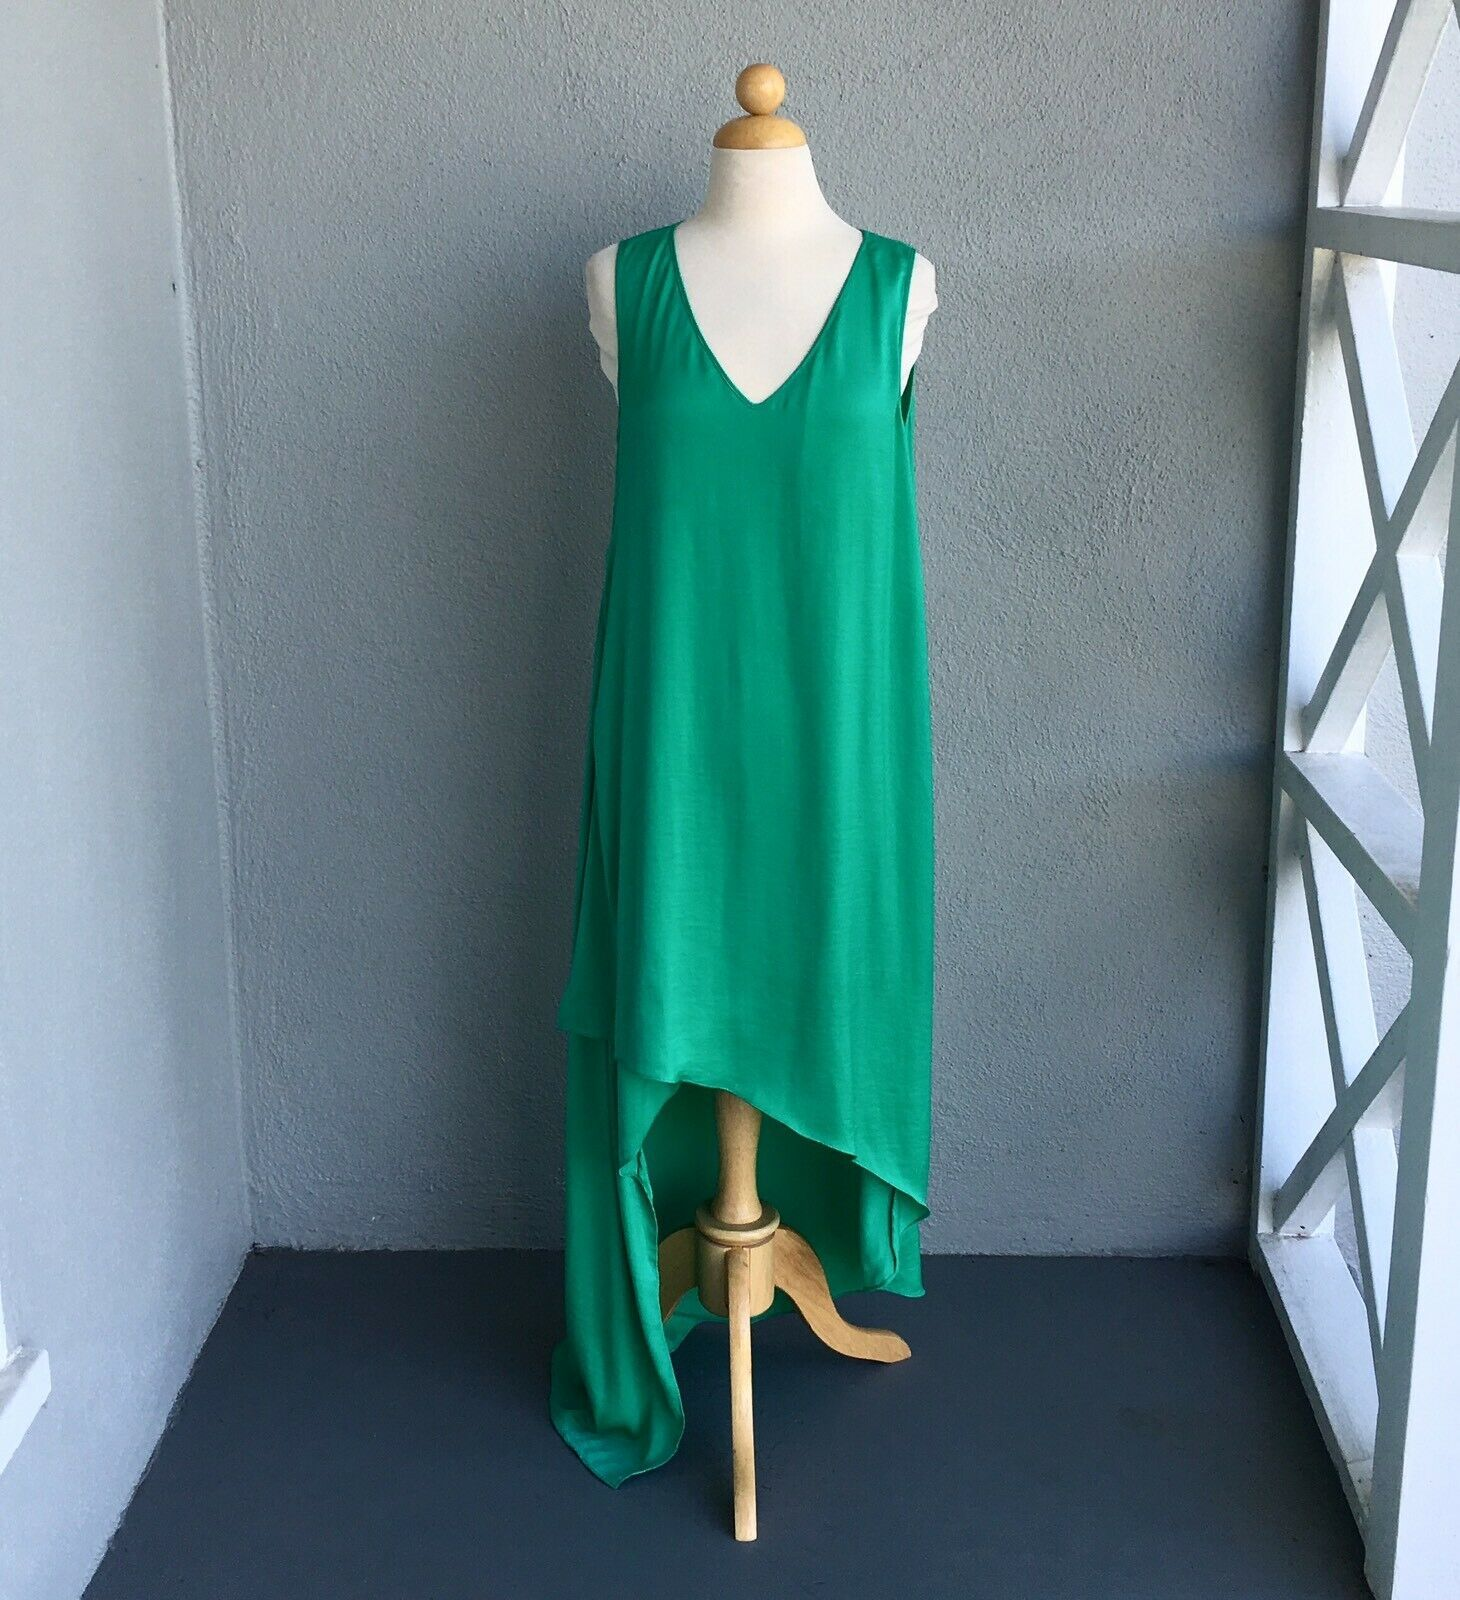 BCBG MAX AZRIA Cadence Blue Cotton Off-Shoulder Front Pockets Dress NEW $198